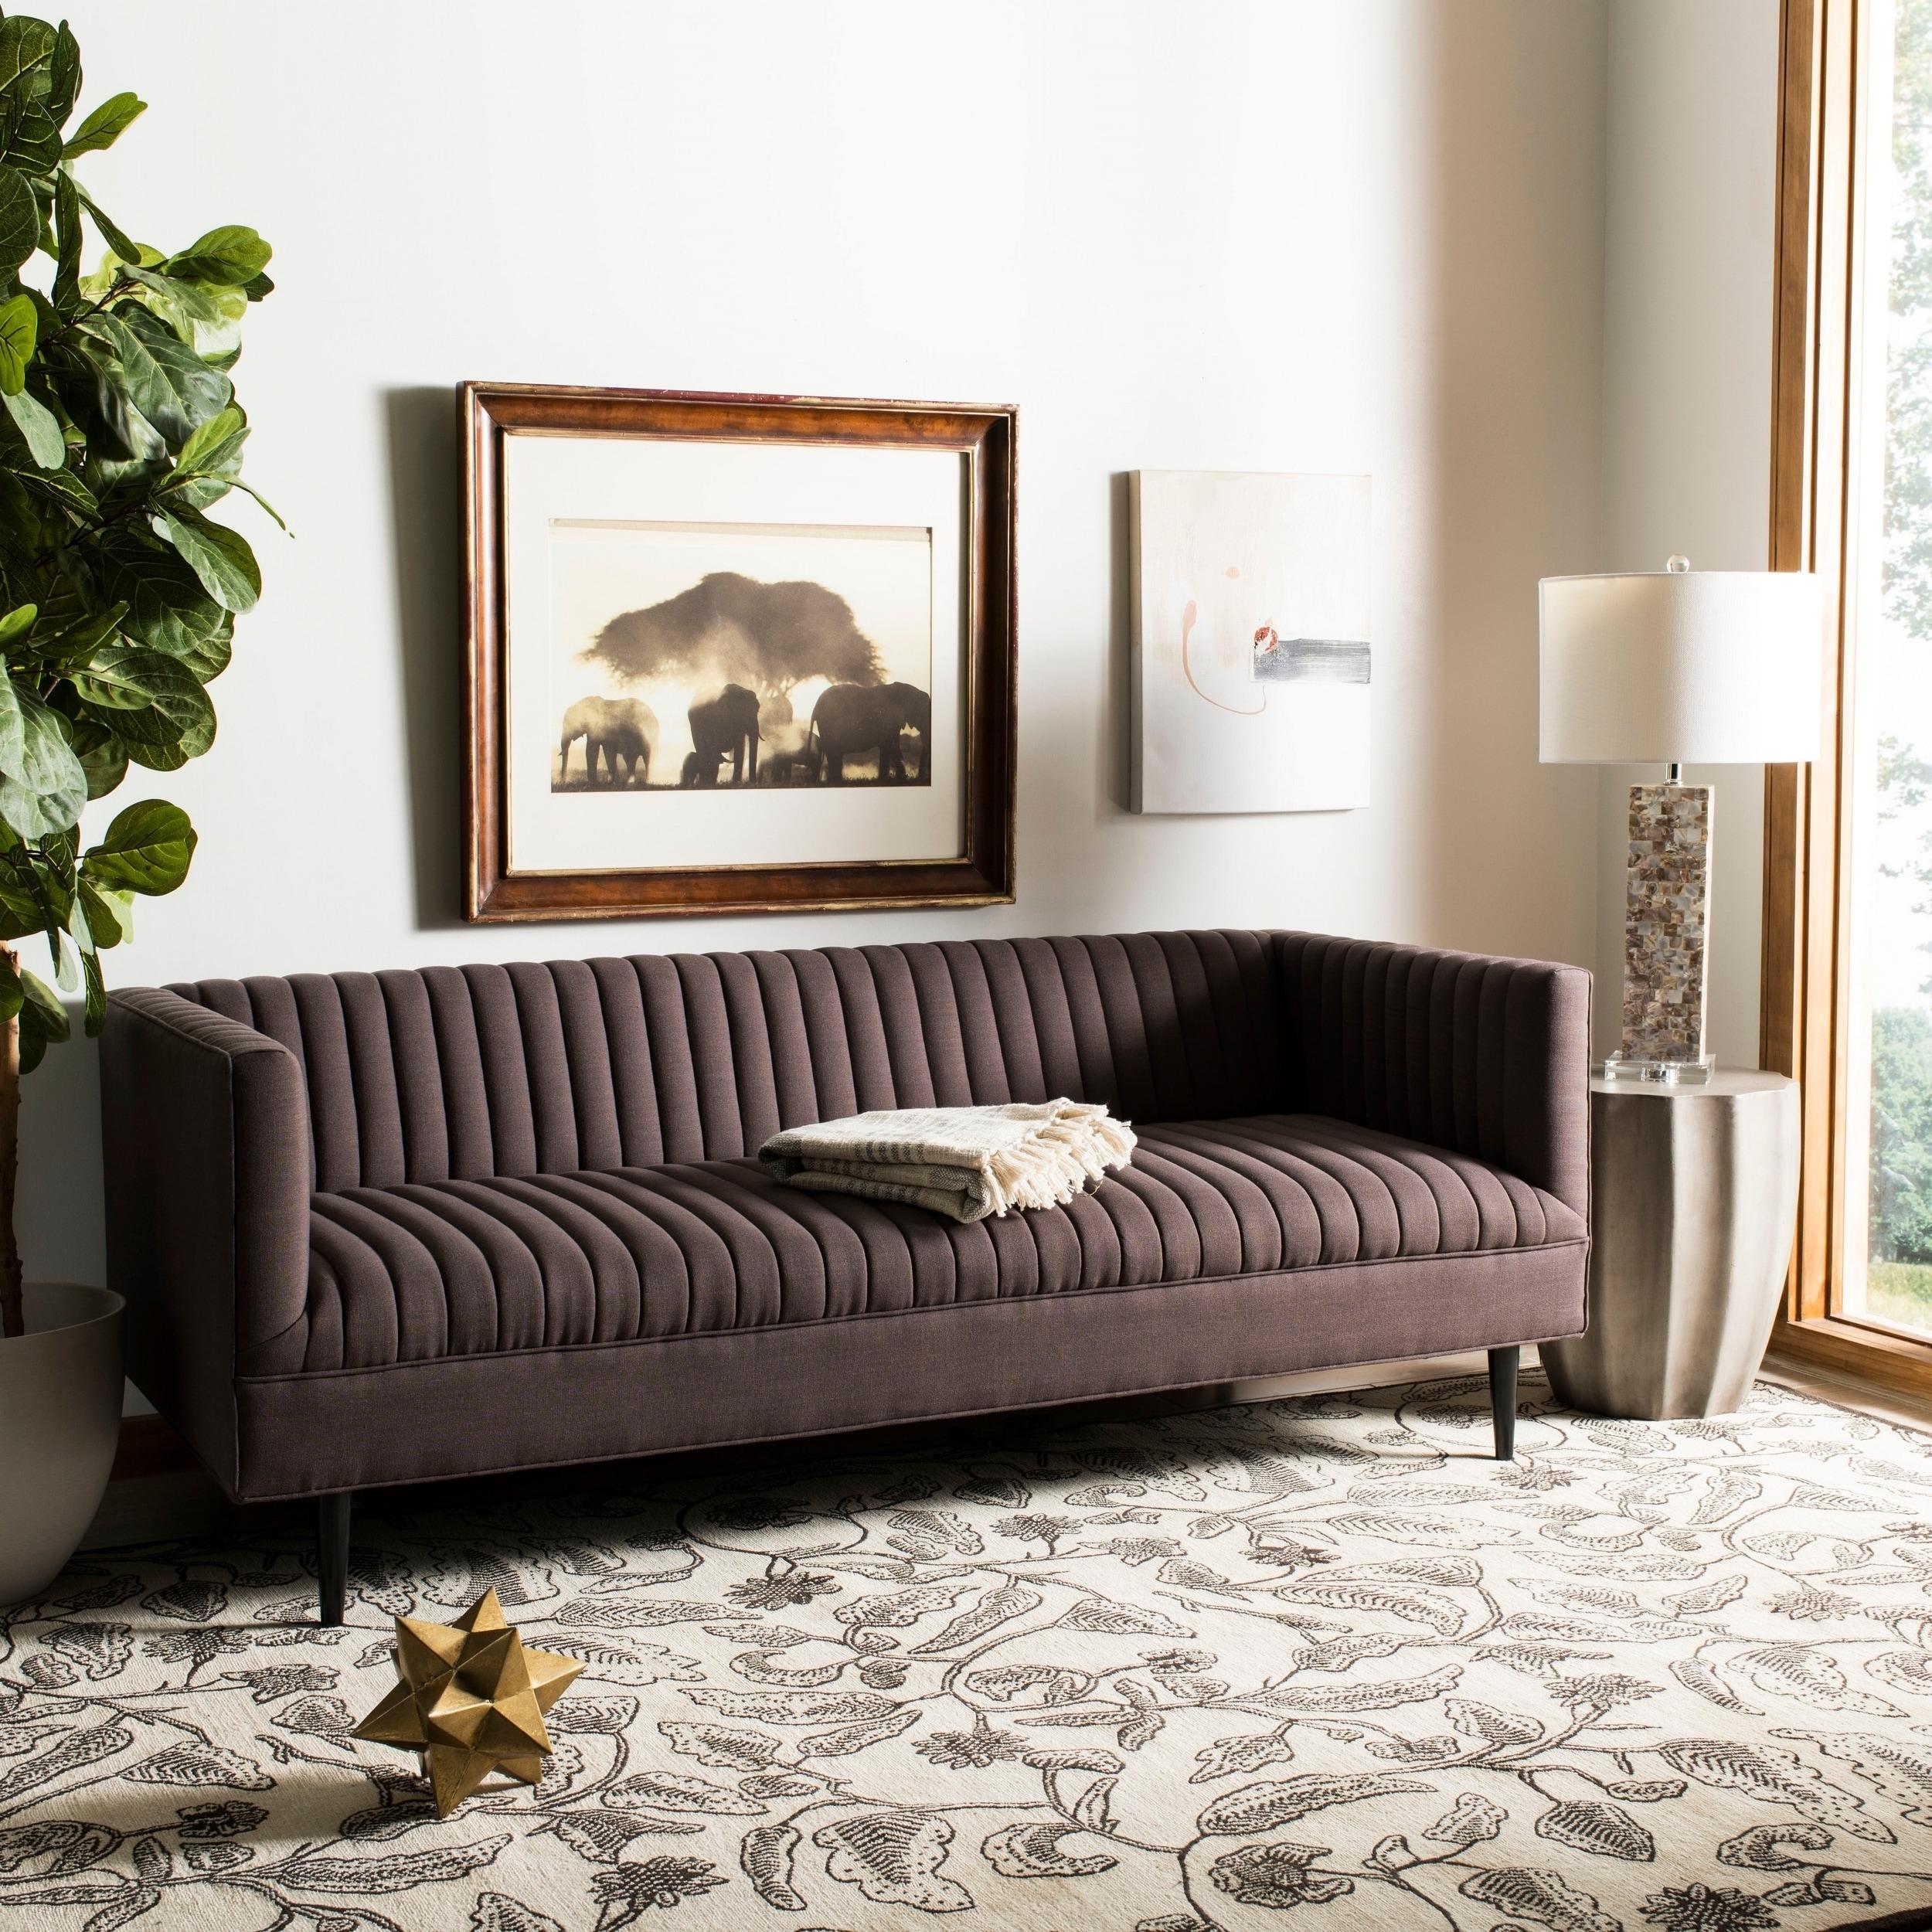 Safavieh couture carmina channeled brown linen sofa